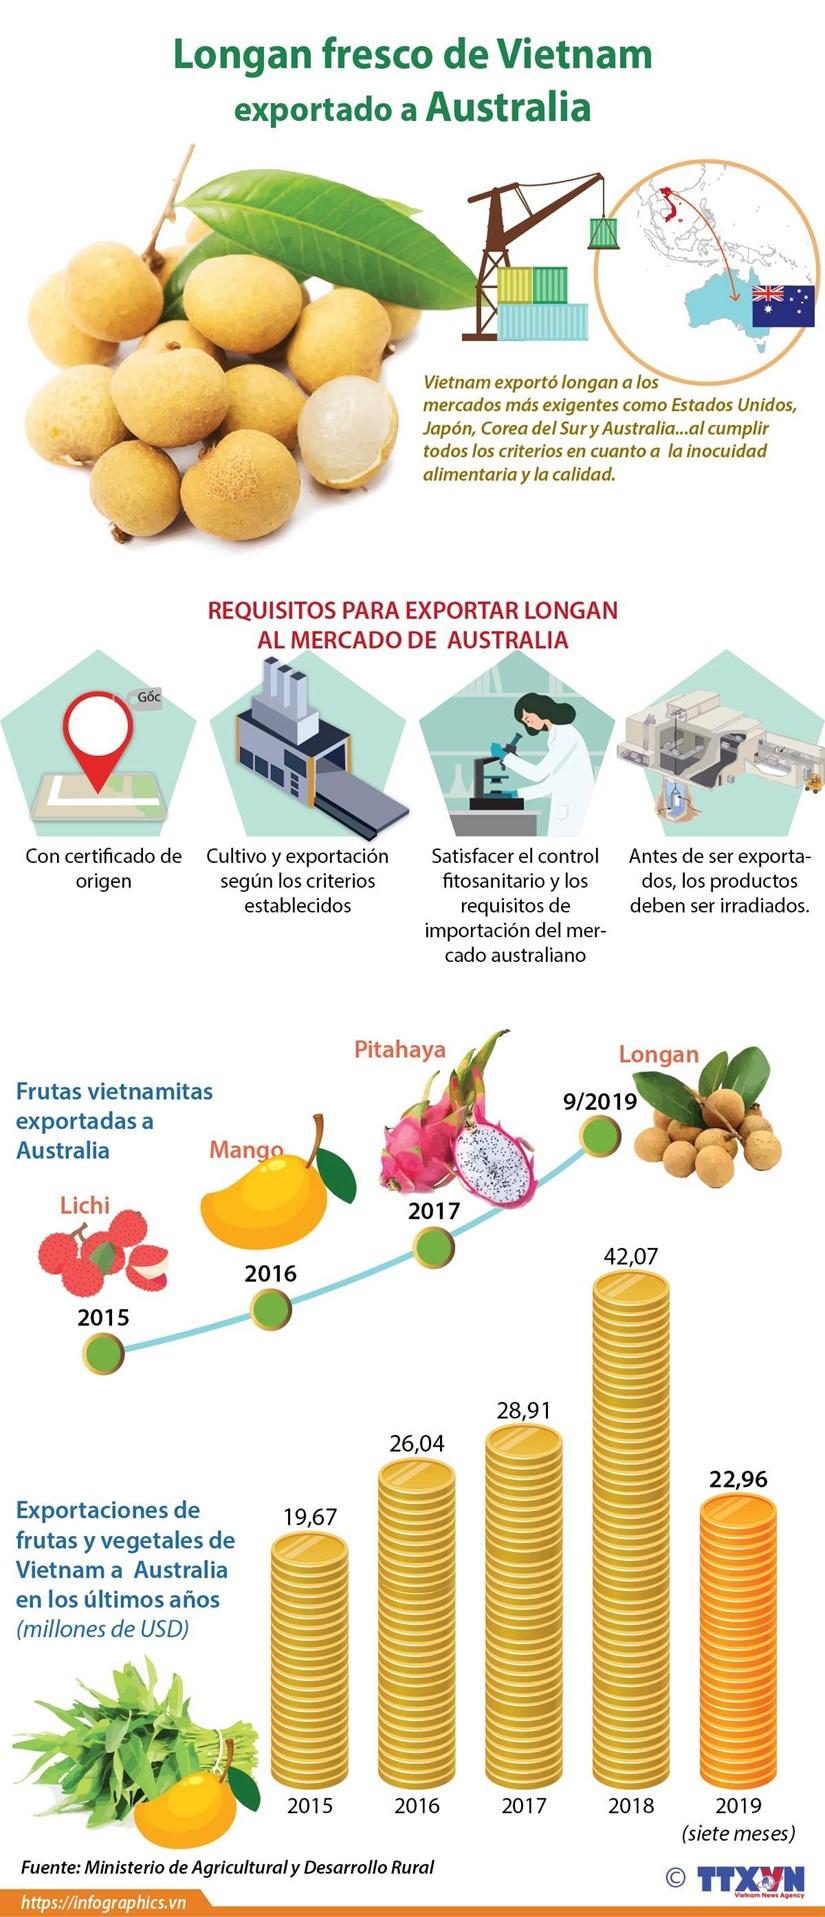 Vietnam exporta longan fresco a Australia hinh anh 1